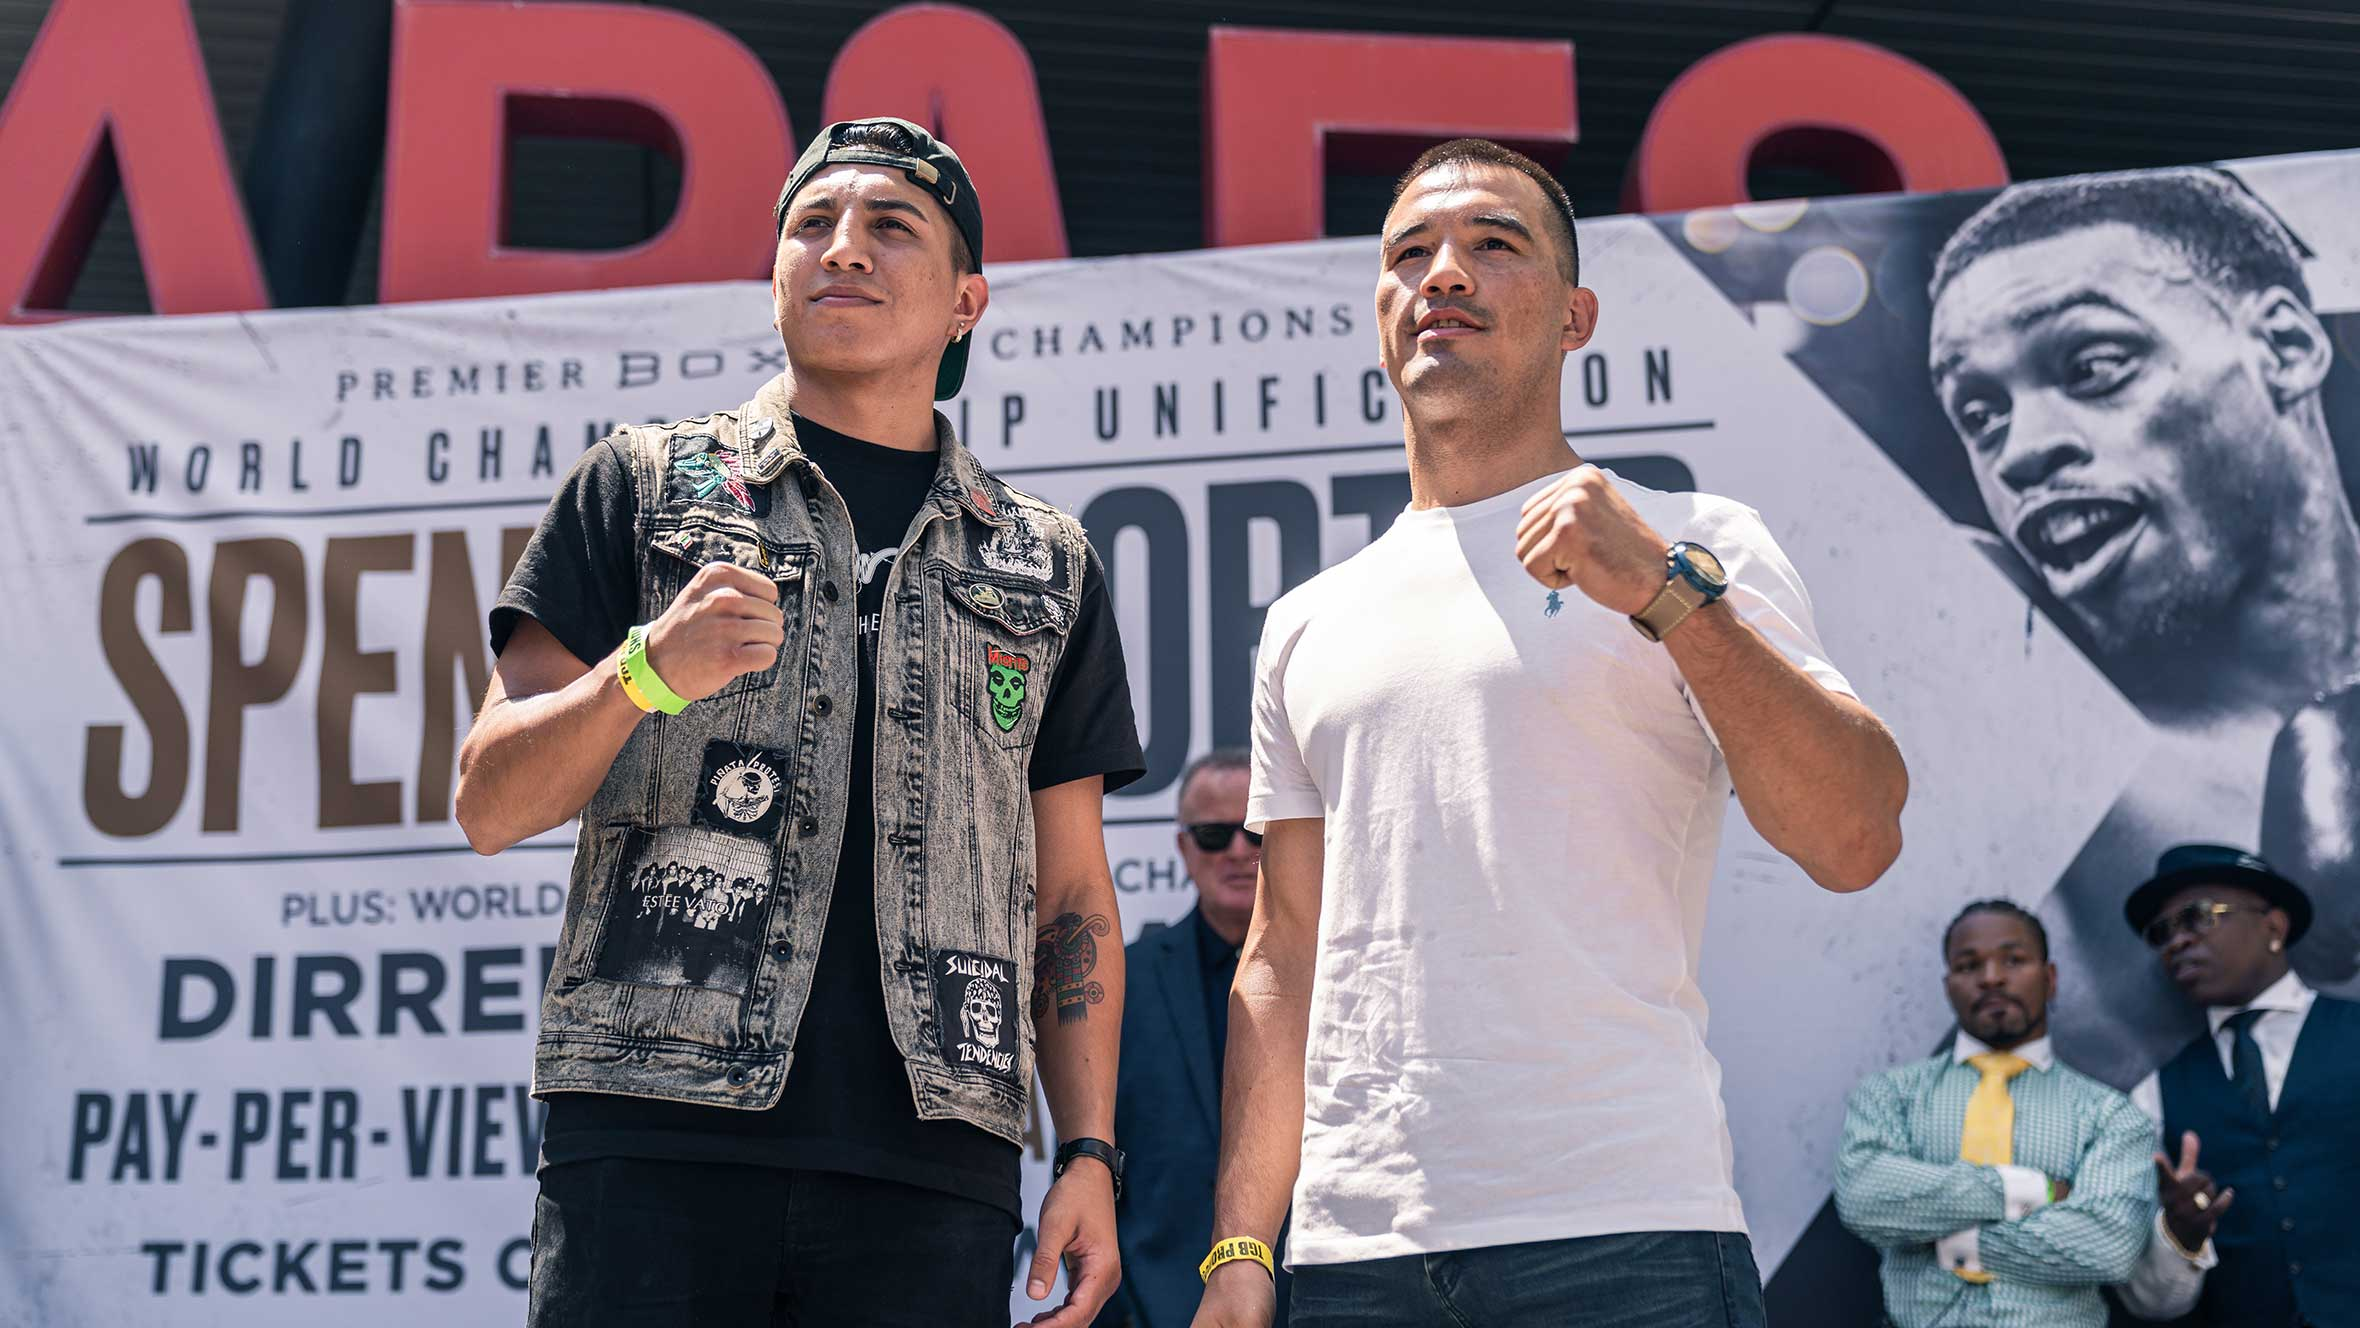 Josesito Lopez - Next Fight, Fighter Bio, Stats & News